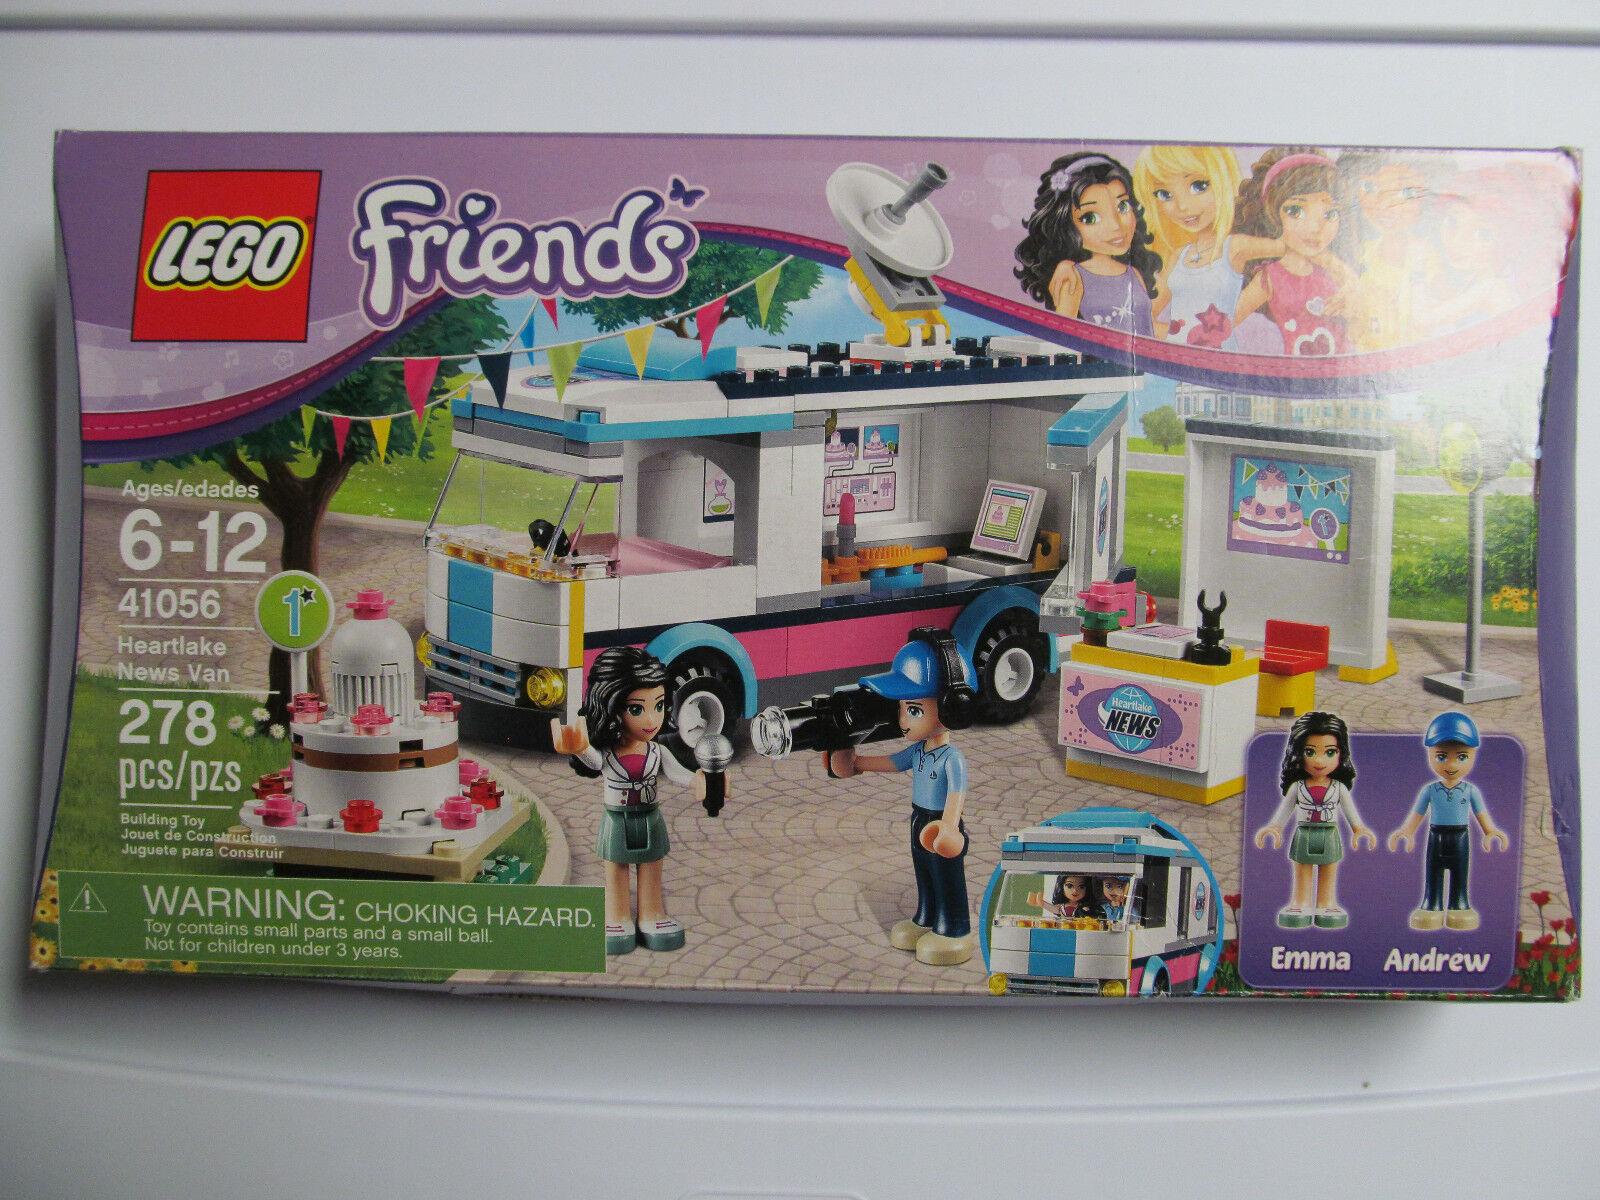 LEGO HEARTLAKE nuovoS VAN 41056 Friends Emma erew sealed  set nuovo  marca